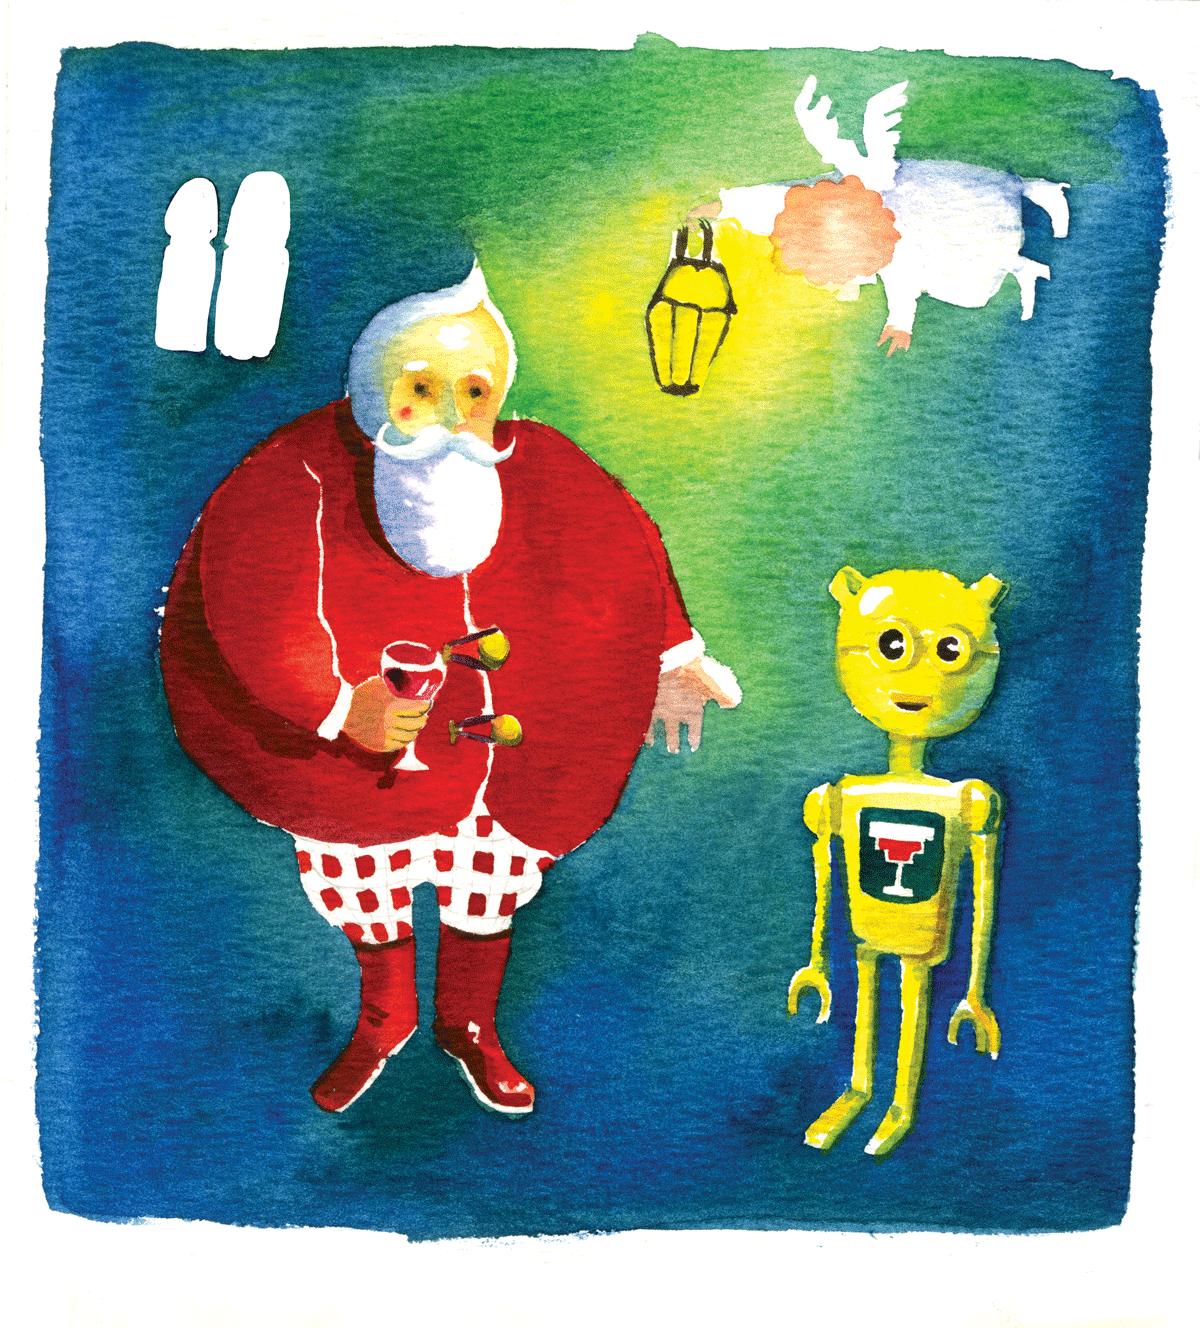 Santa-Claus-Robot-OBR